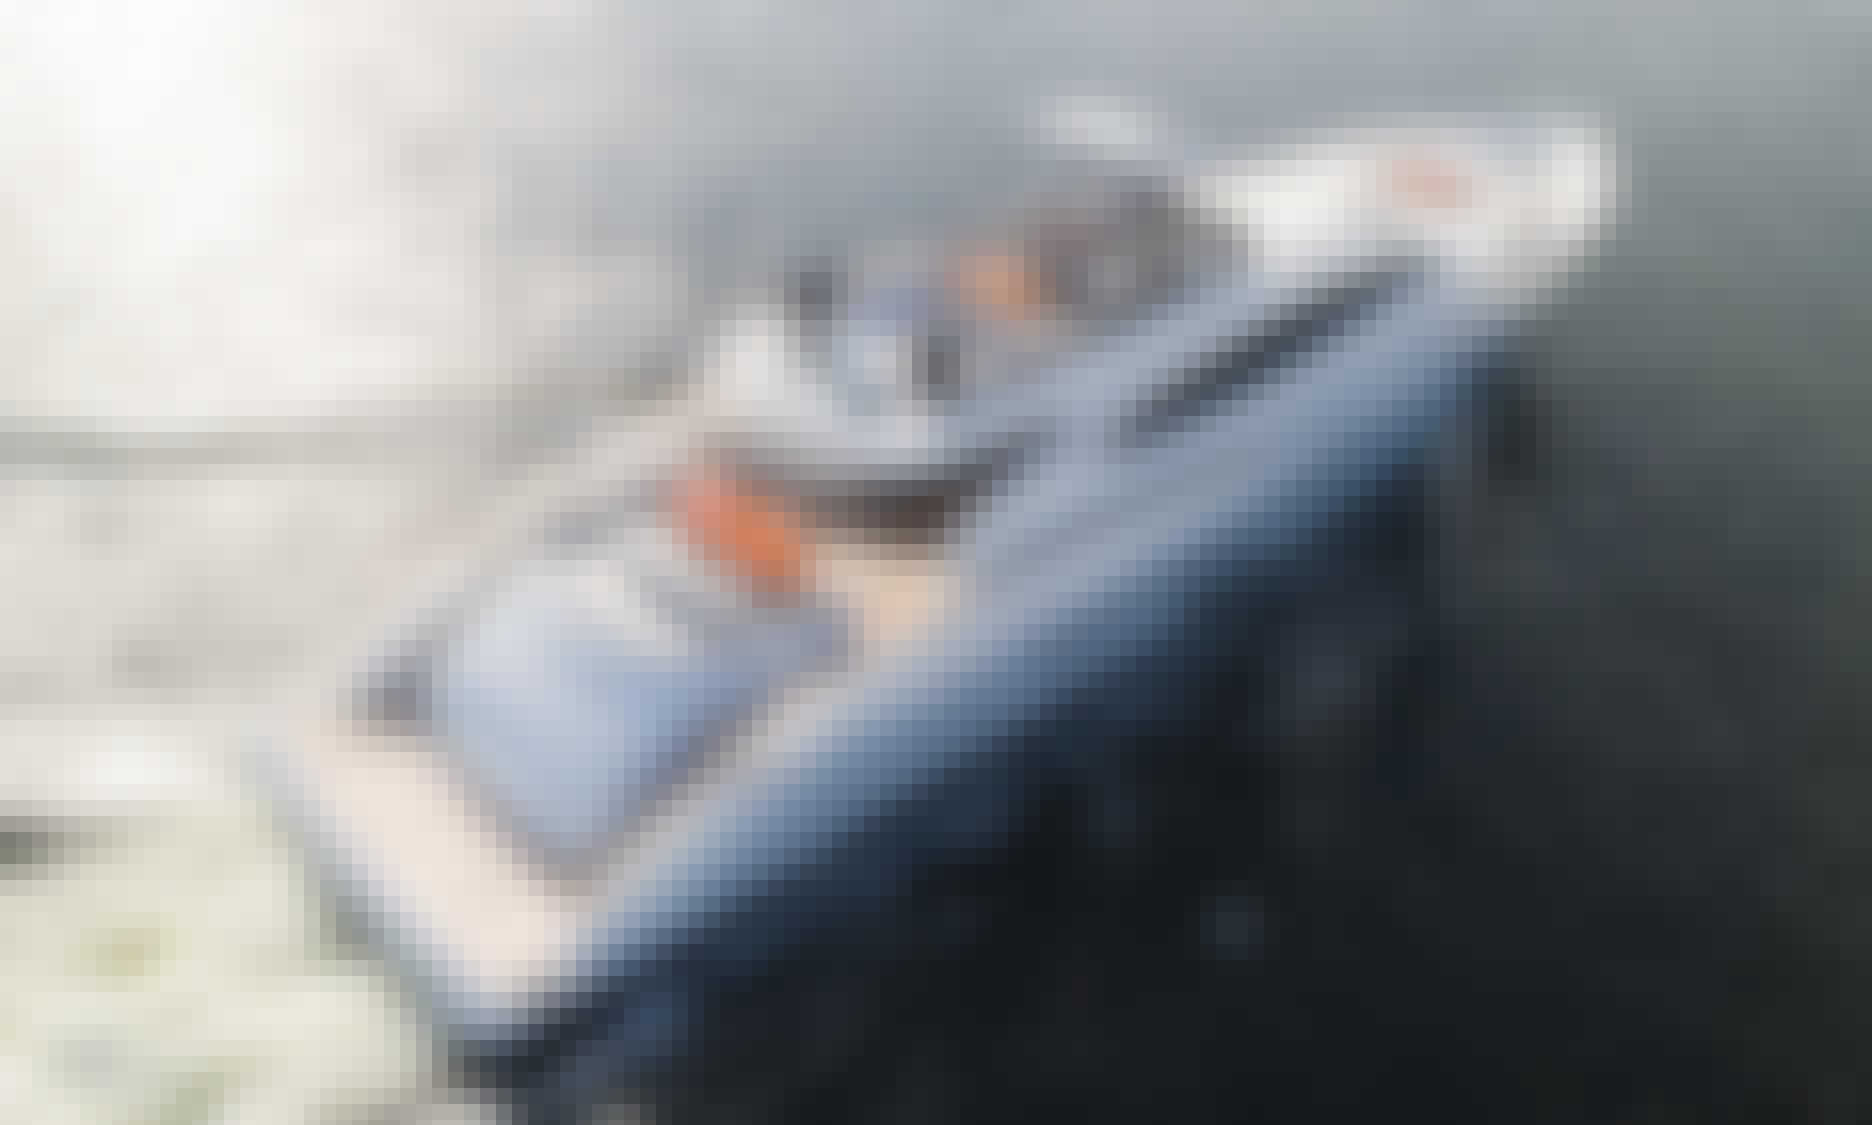 Sophisticated and Stylish Lazzara LSX 92 Power Mega Yacht in Miami